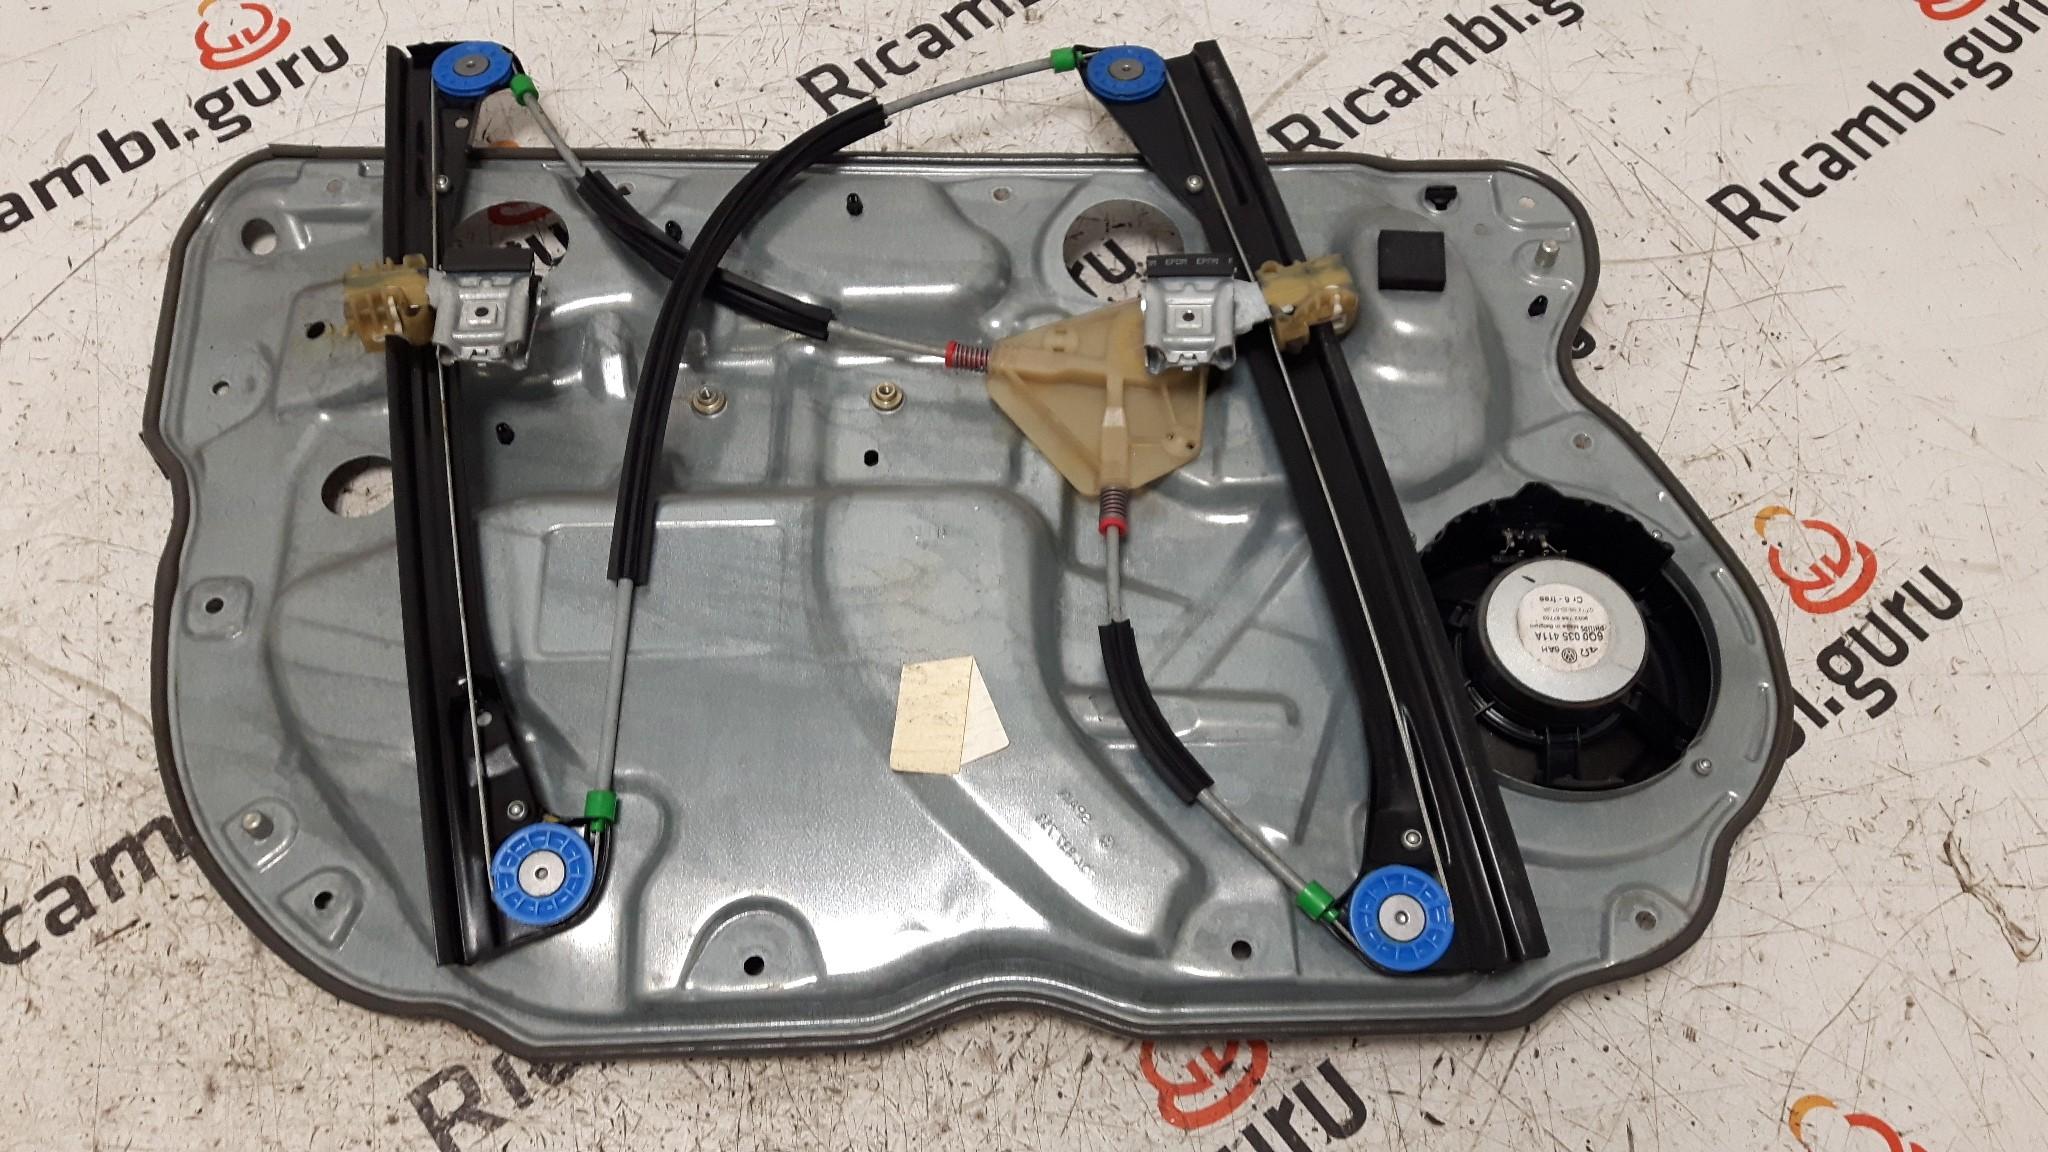 Telaio alzacristallo Anteriore Destro Volkswagen polo